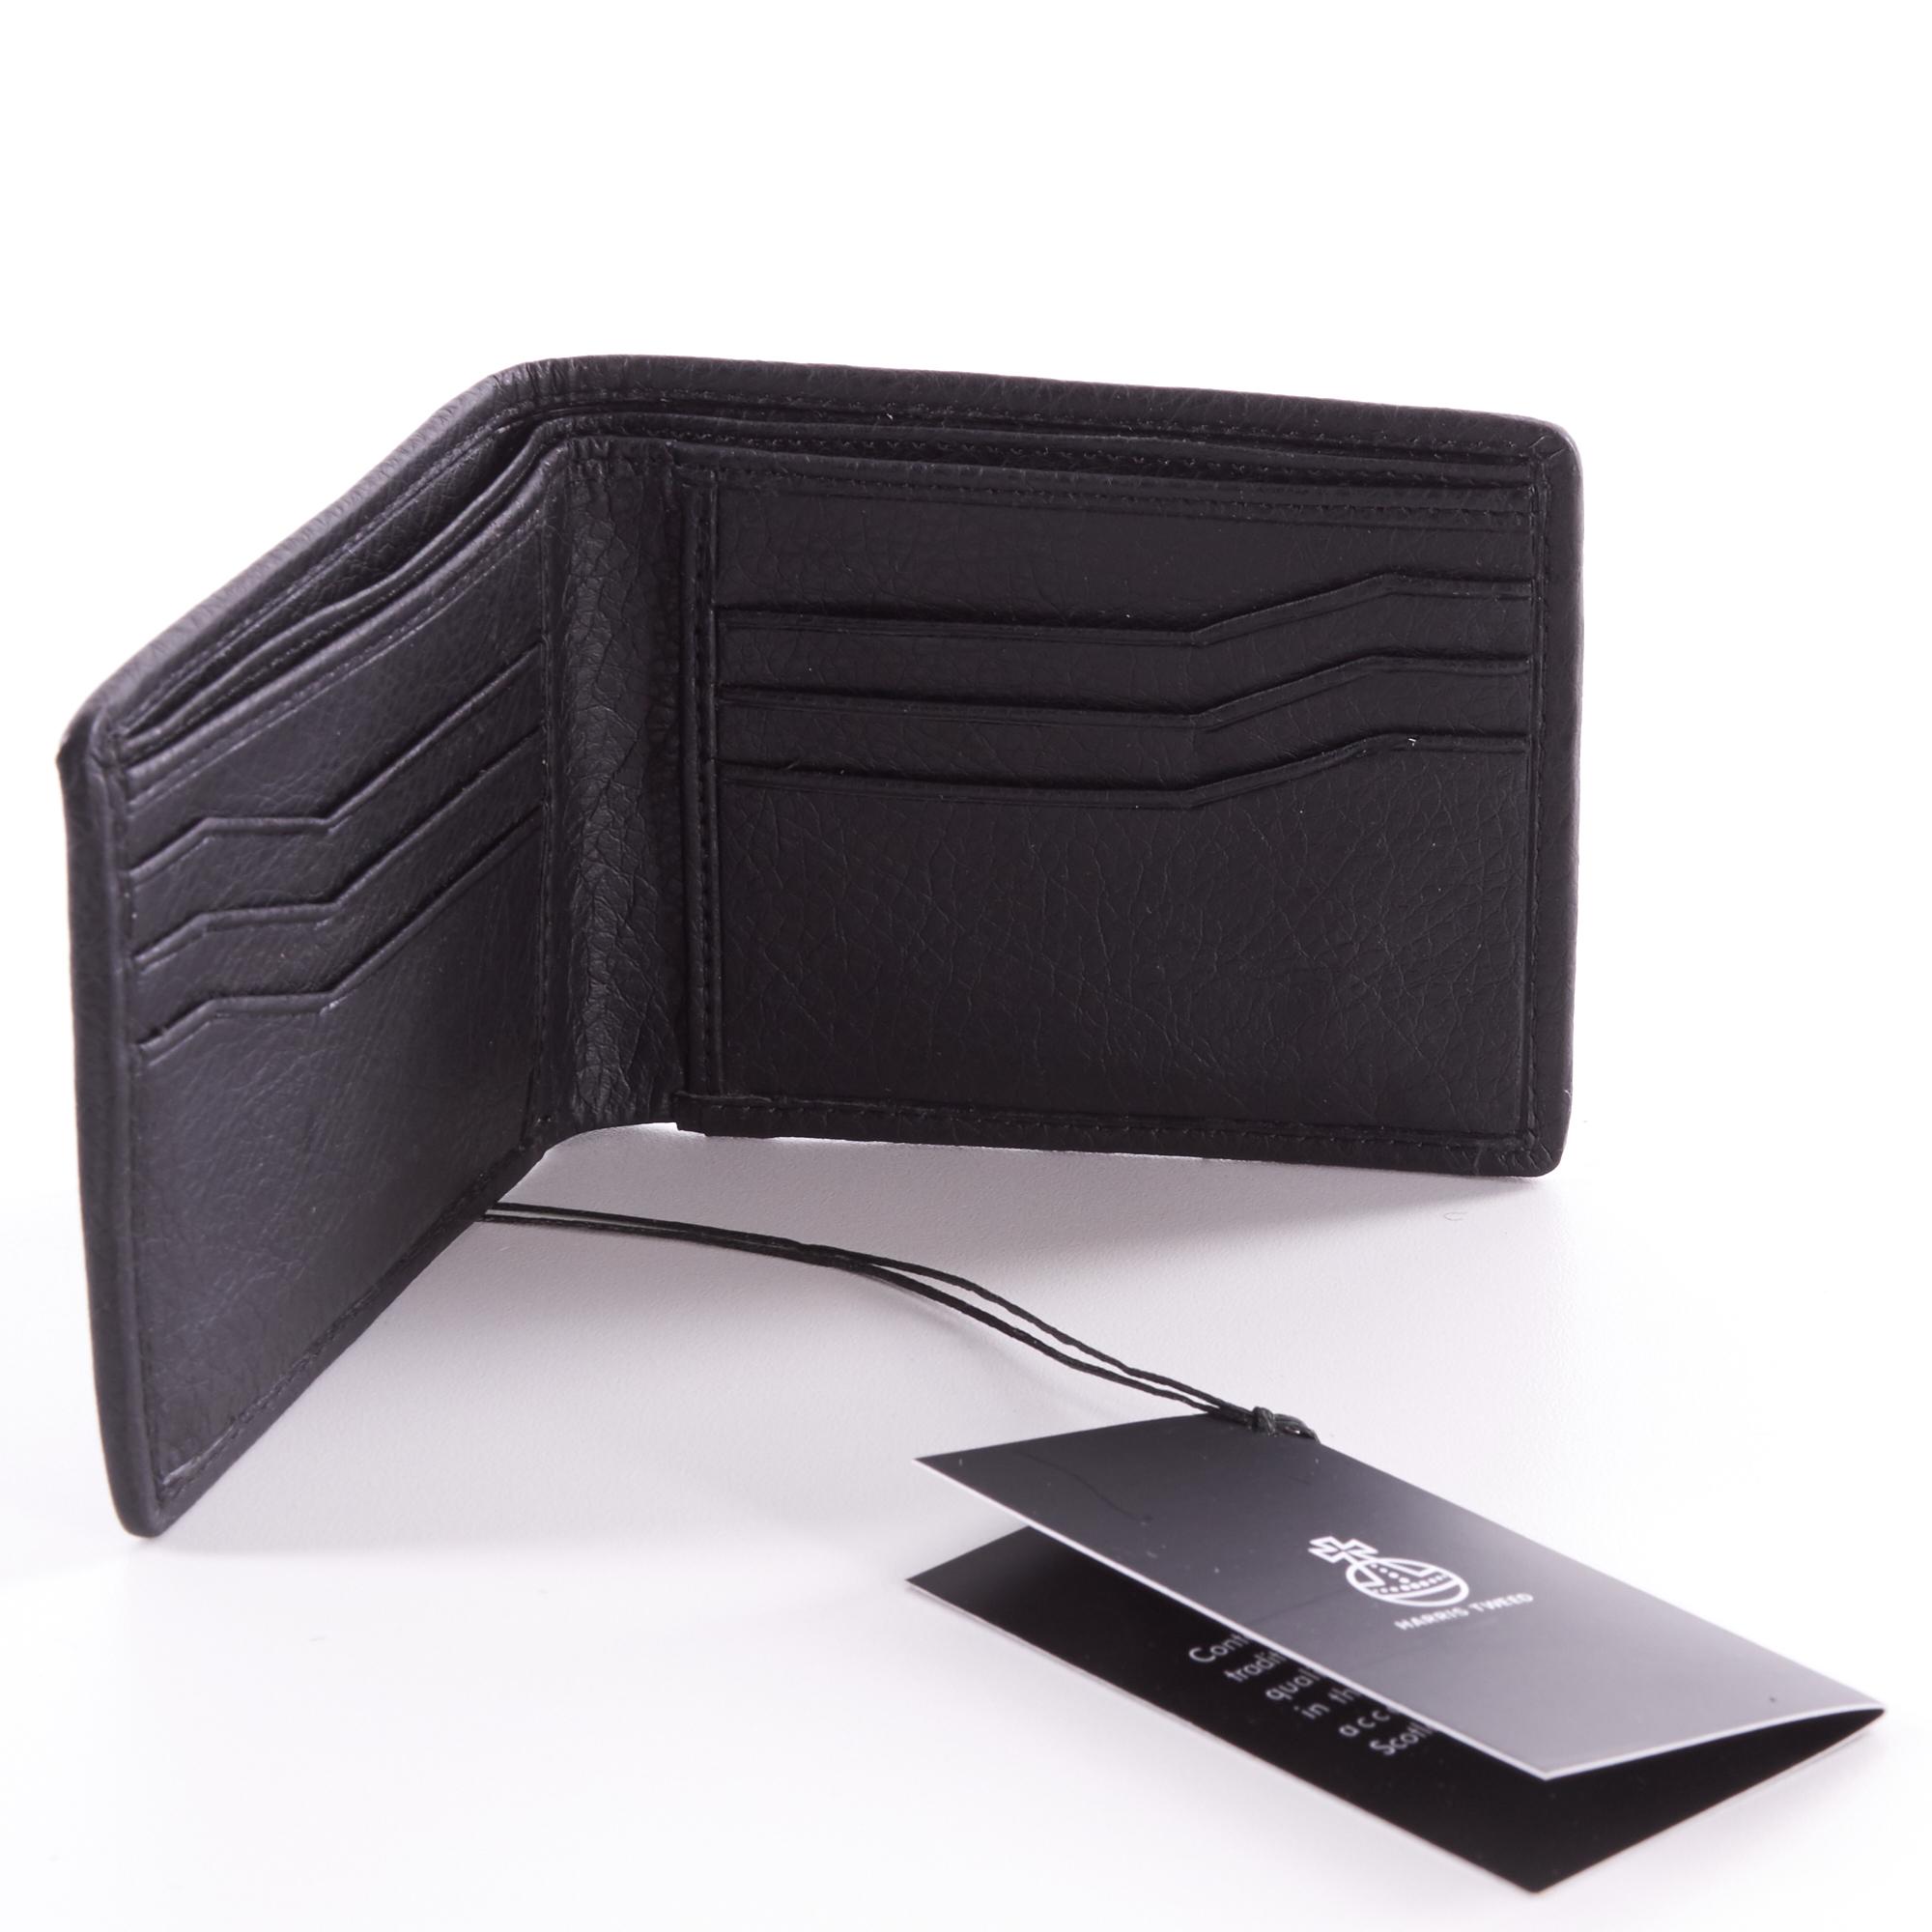 Hebridean Storm Harris Tweed Bi-Fold Wallet